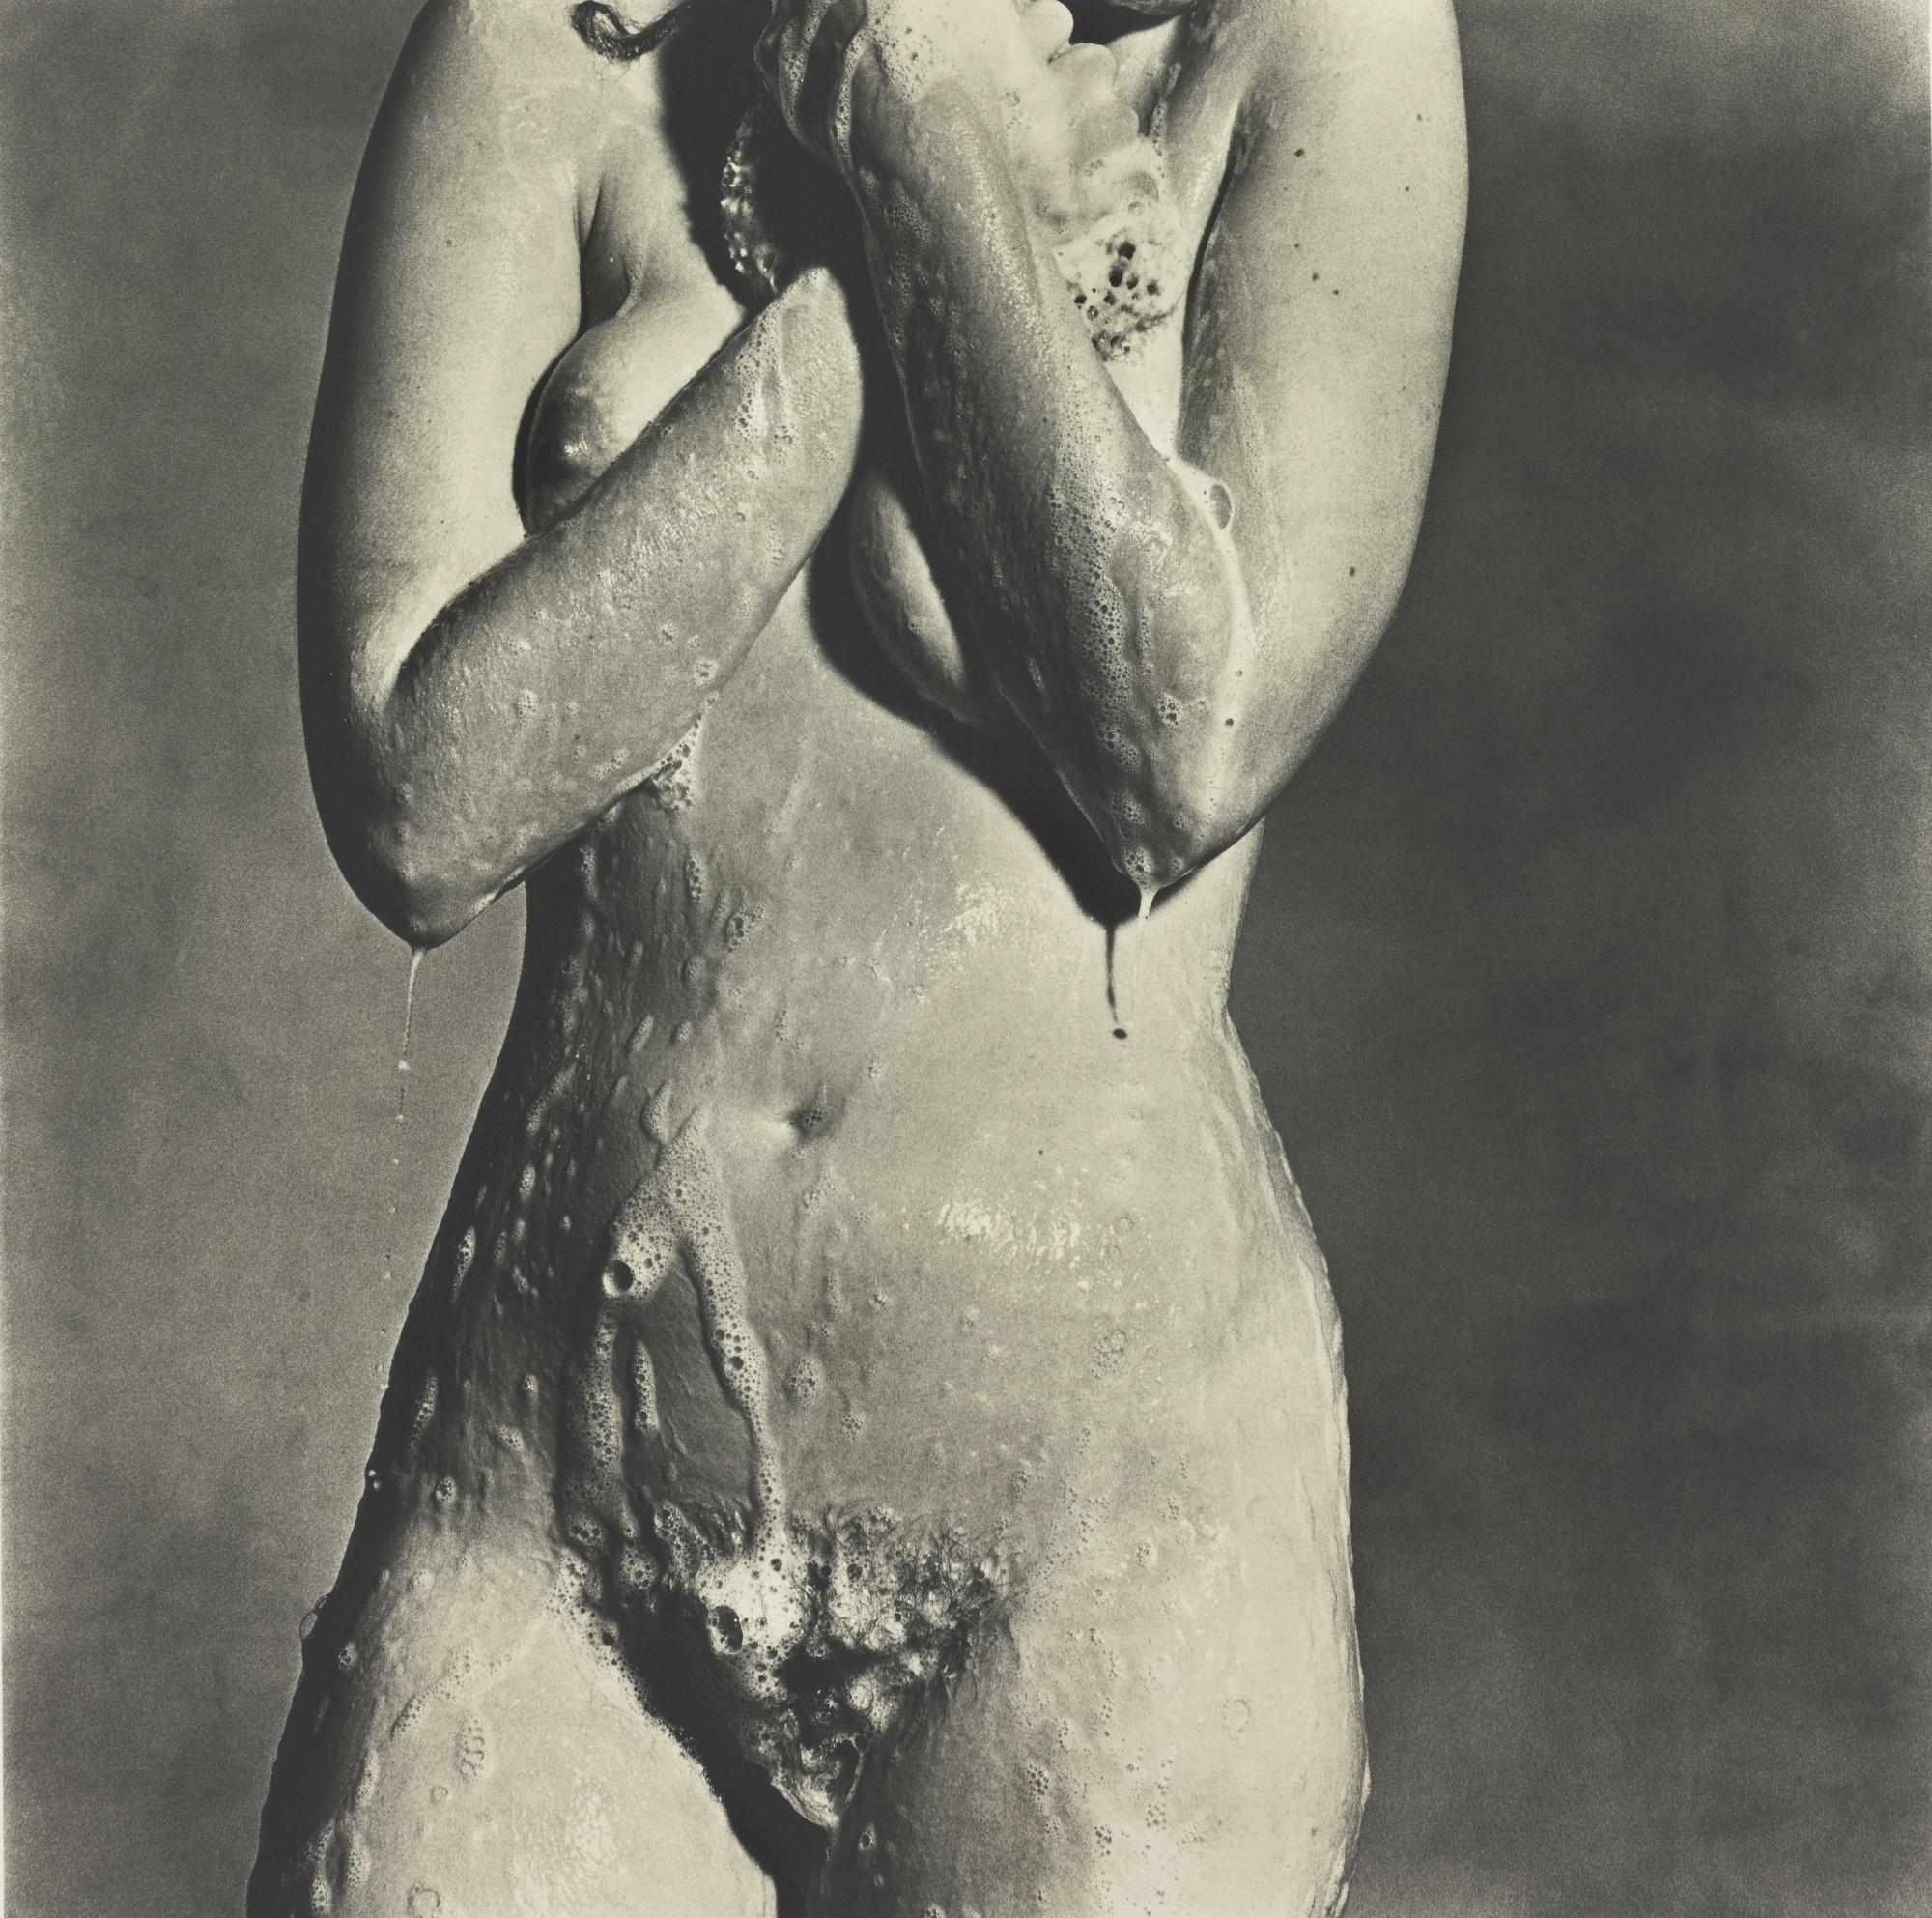 Irving_Penn_-_Nude_Torso__Soaping__New_York__1978